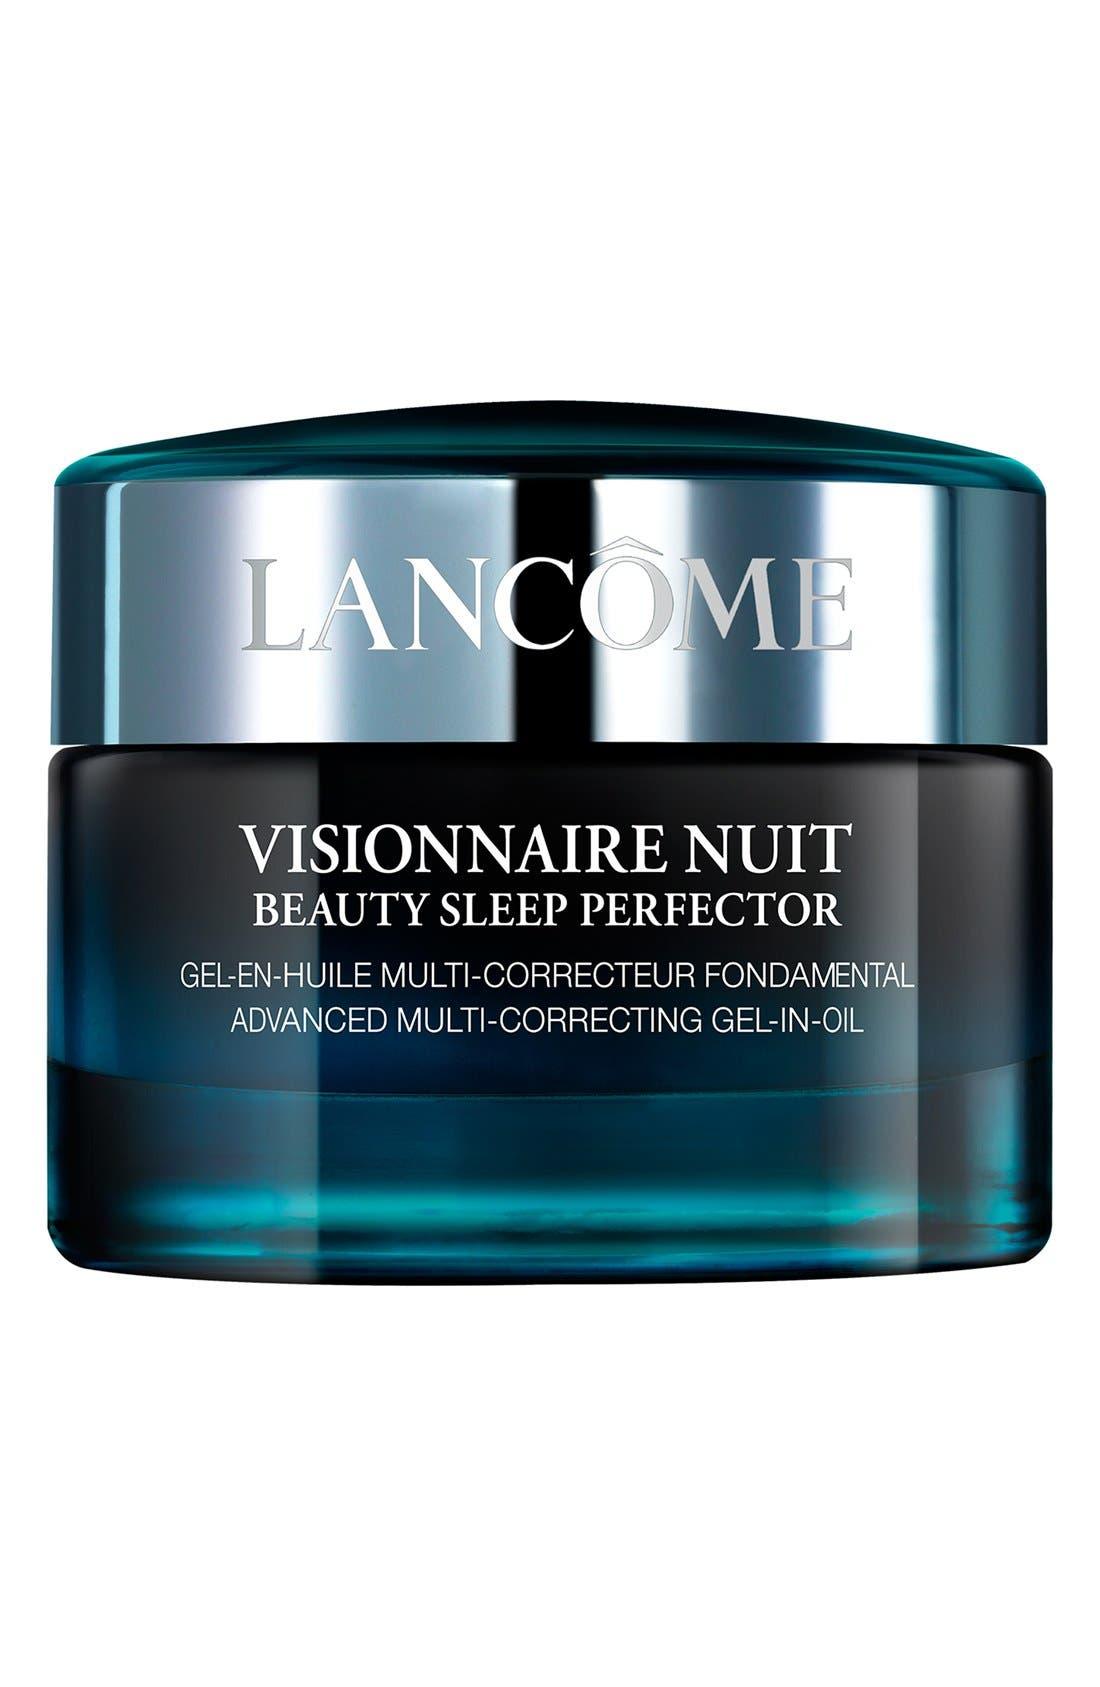 Lancome Visionnaire Nuit Beauty Sleep Night Moisturizer Cream